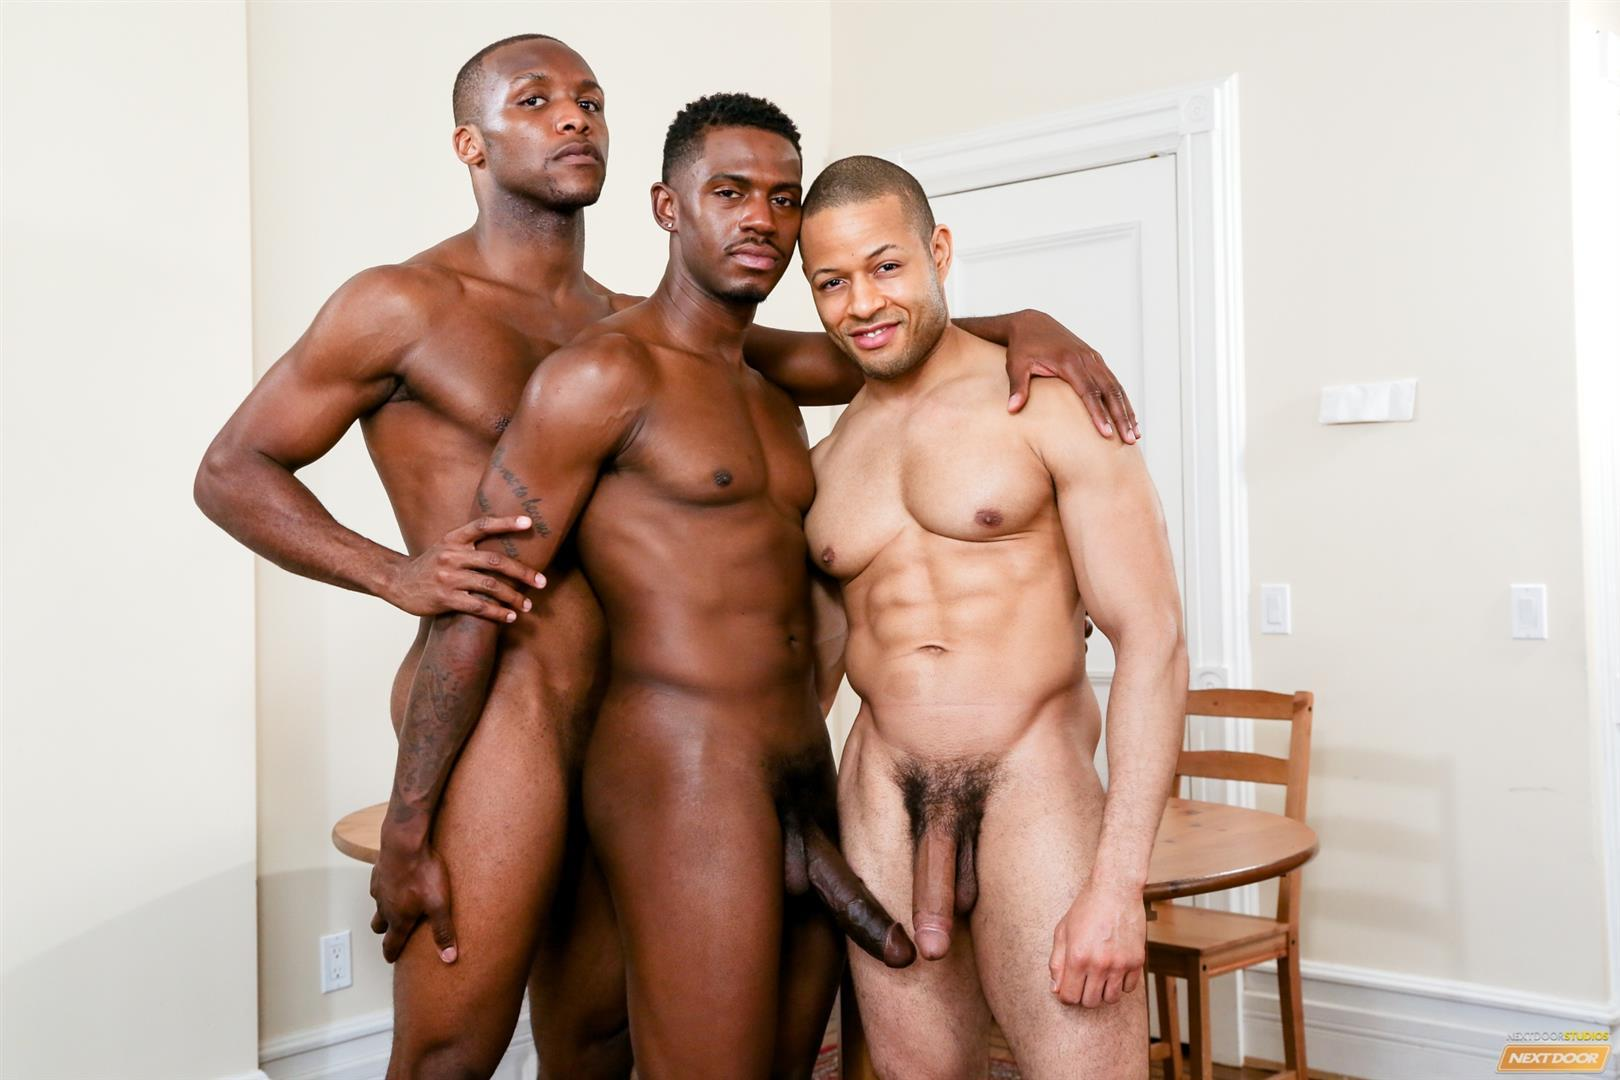 Three weird gay dudes banging in threesome 3